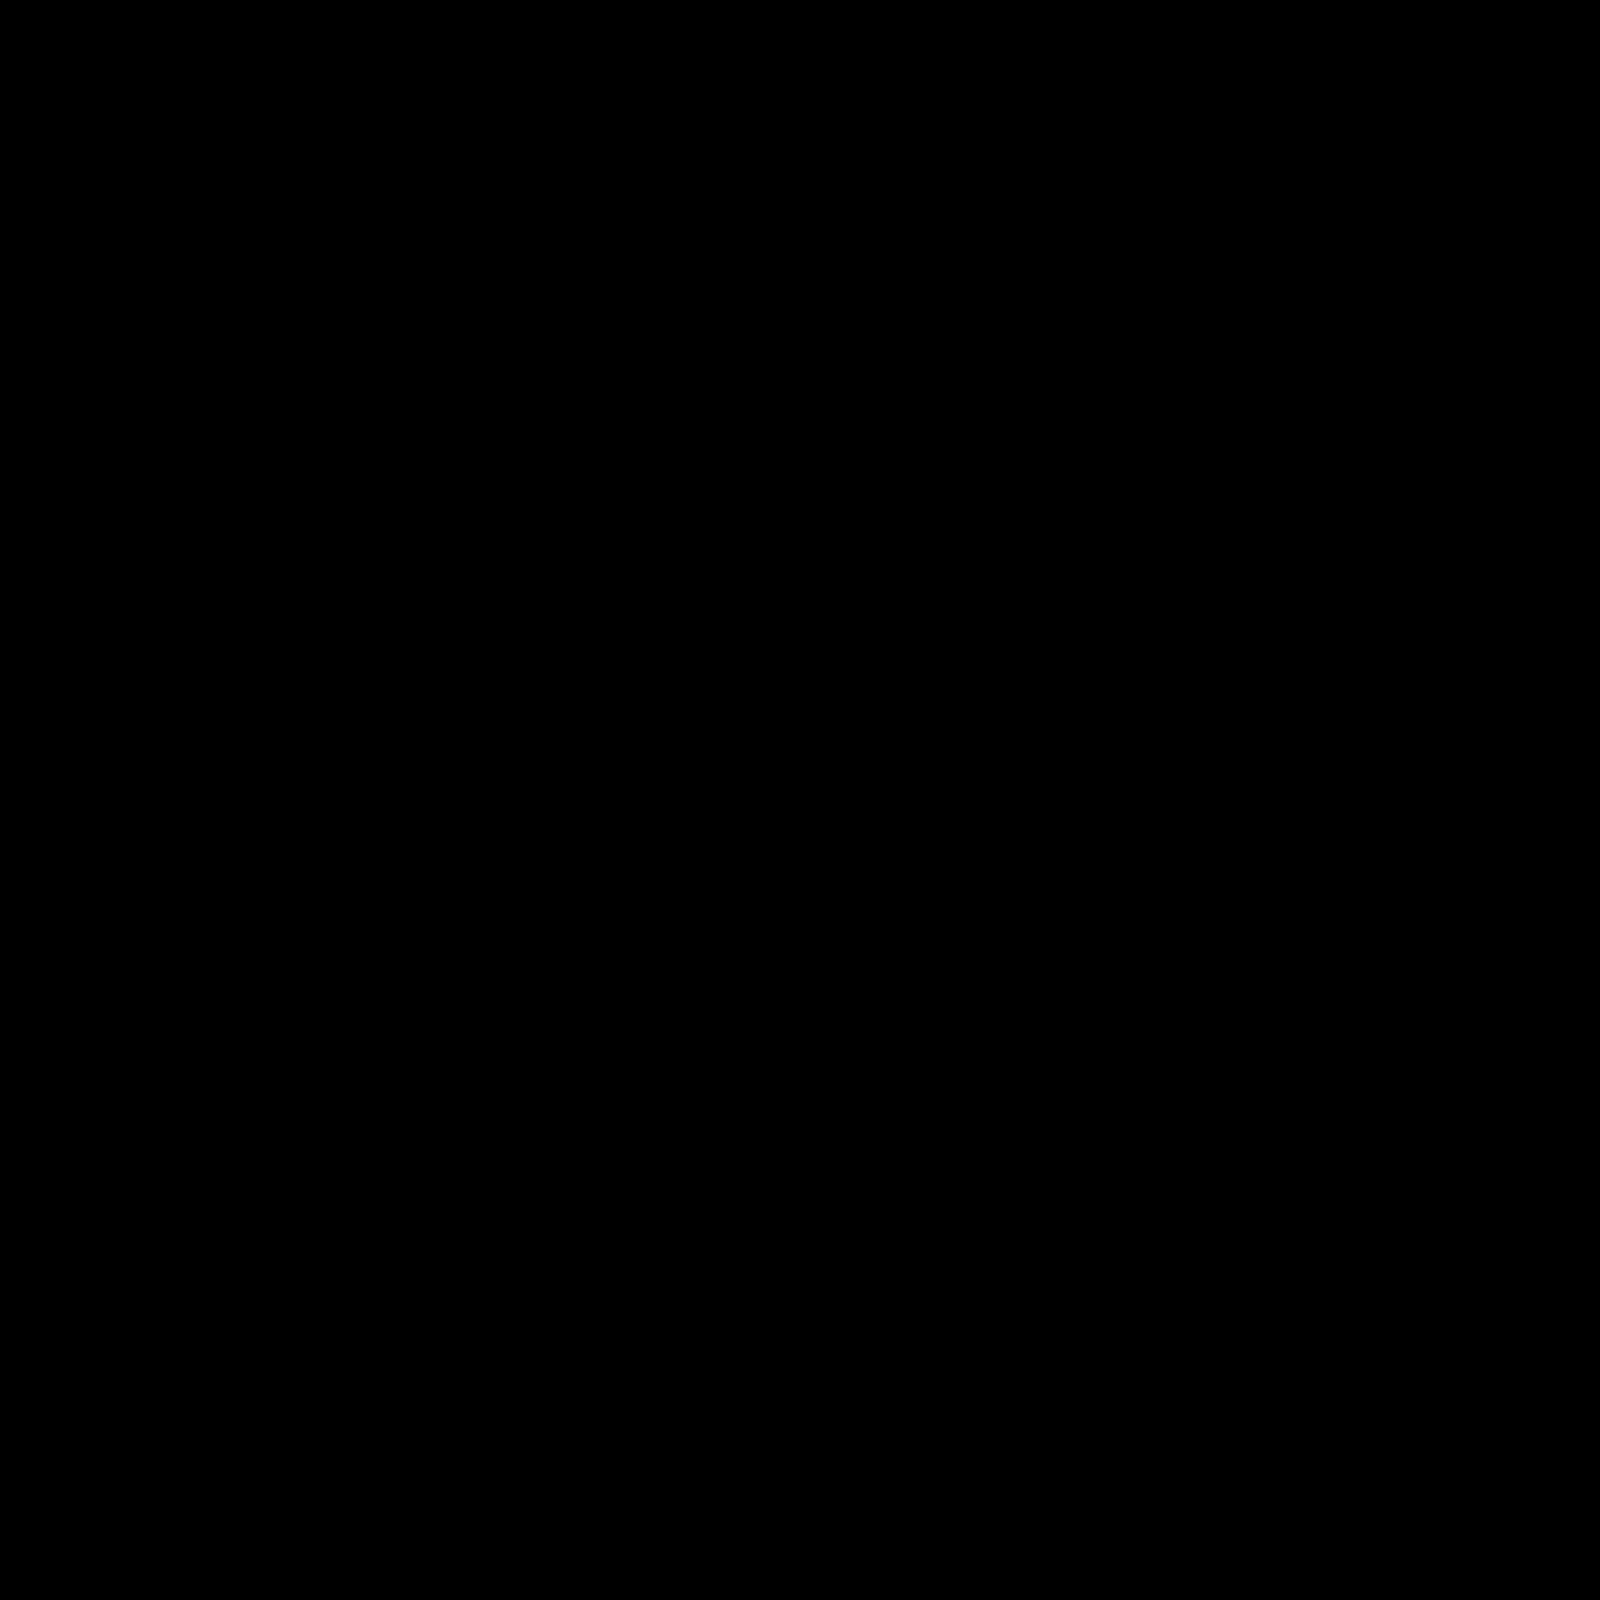 Konfetti icon